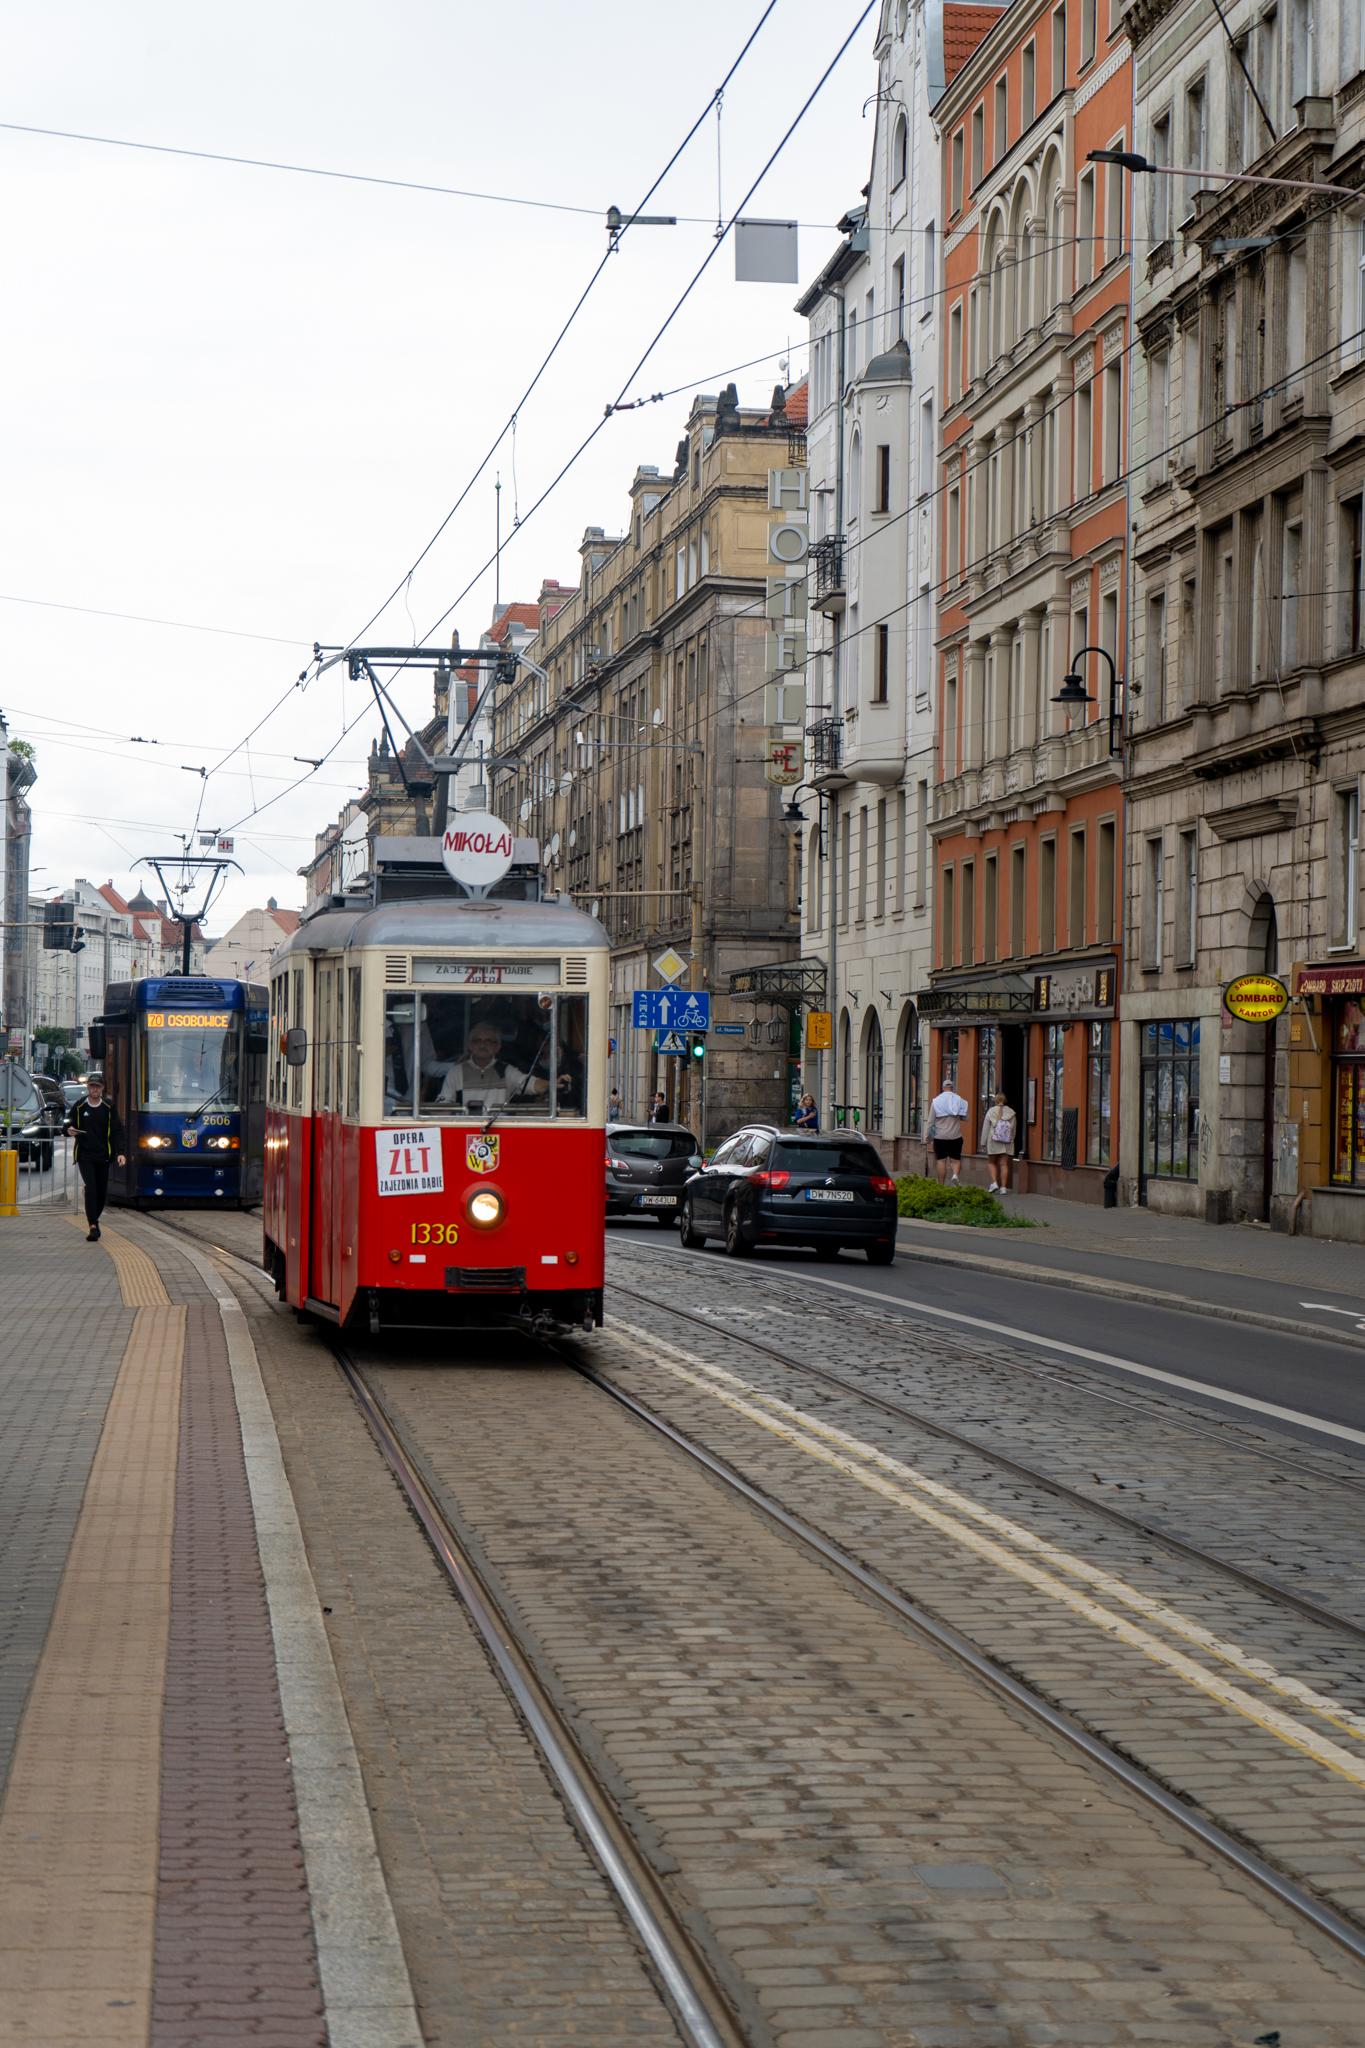 Alte Straßenbahn in Breslau